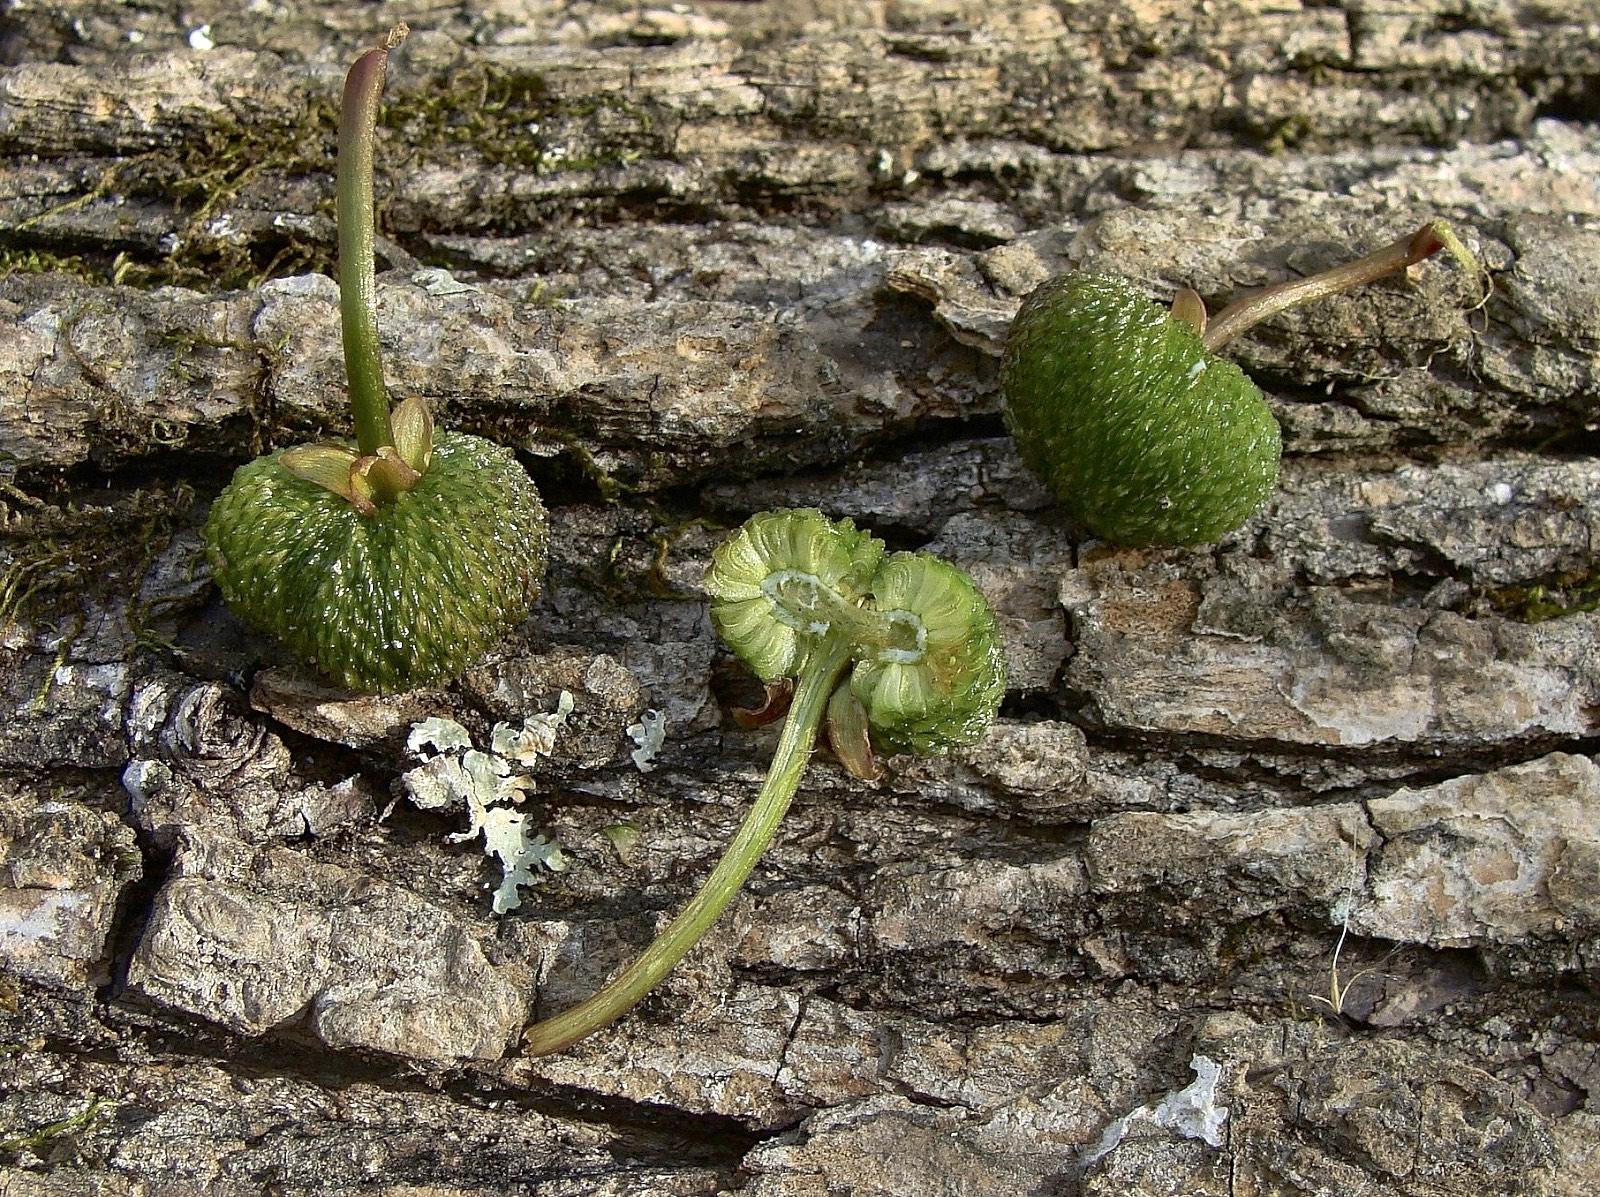 Arrowhead - Sagittaria platyphylla